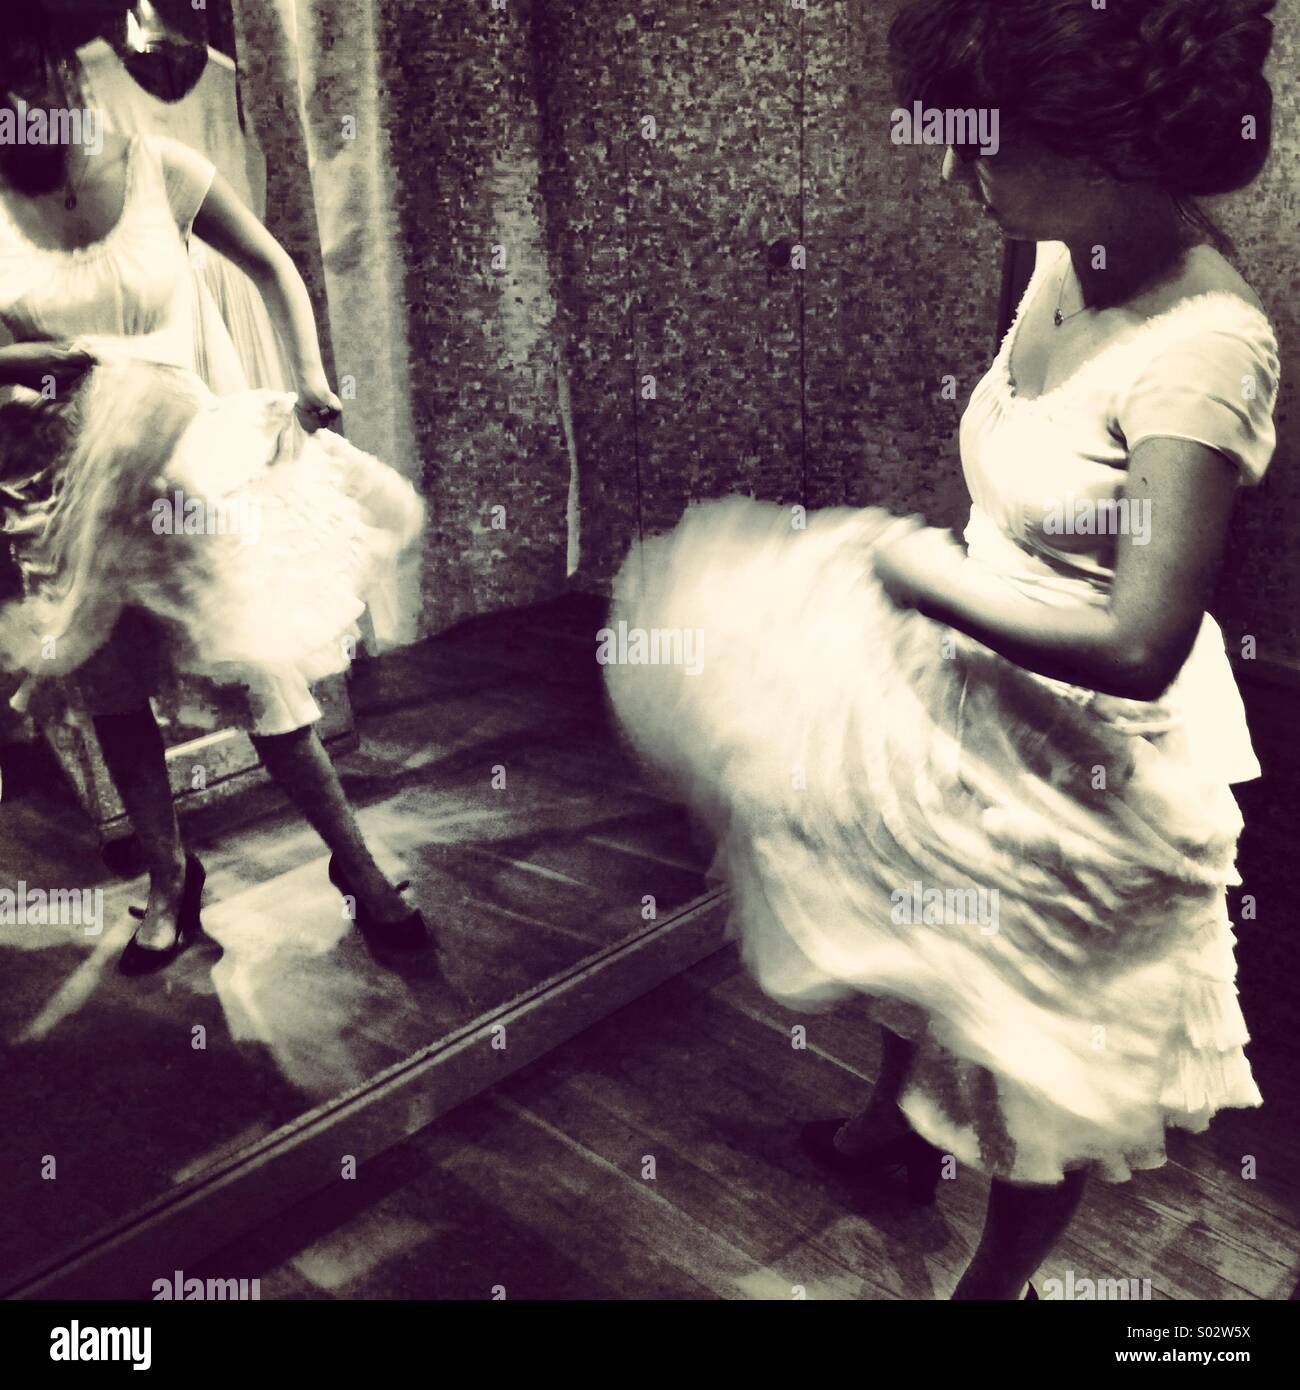 Mouvement robe de mariage Photo Stock